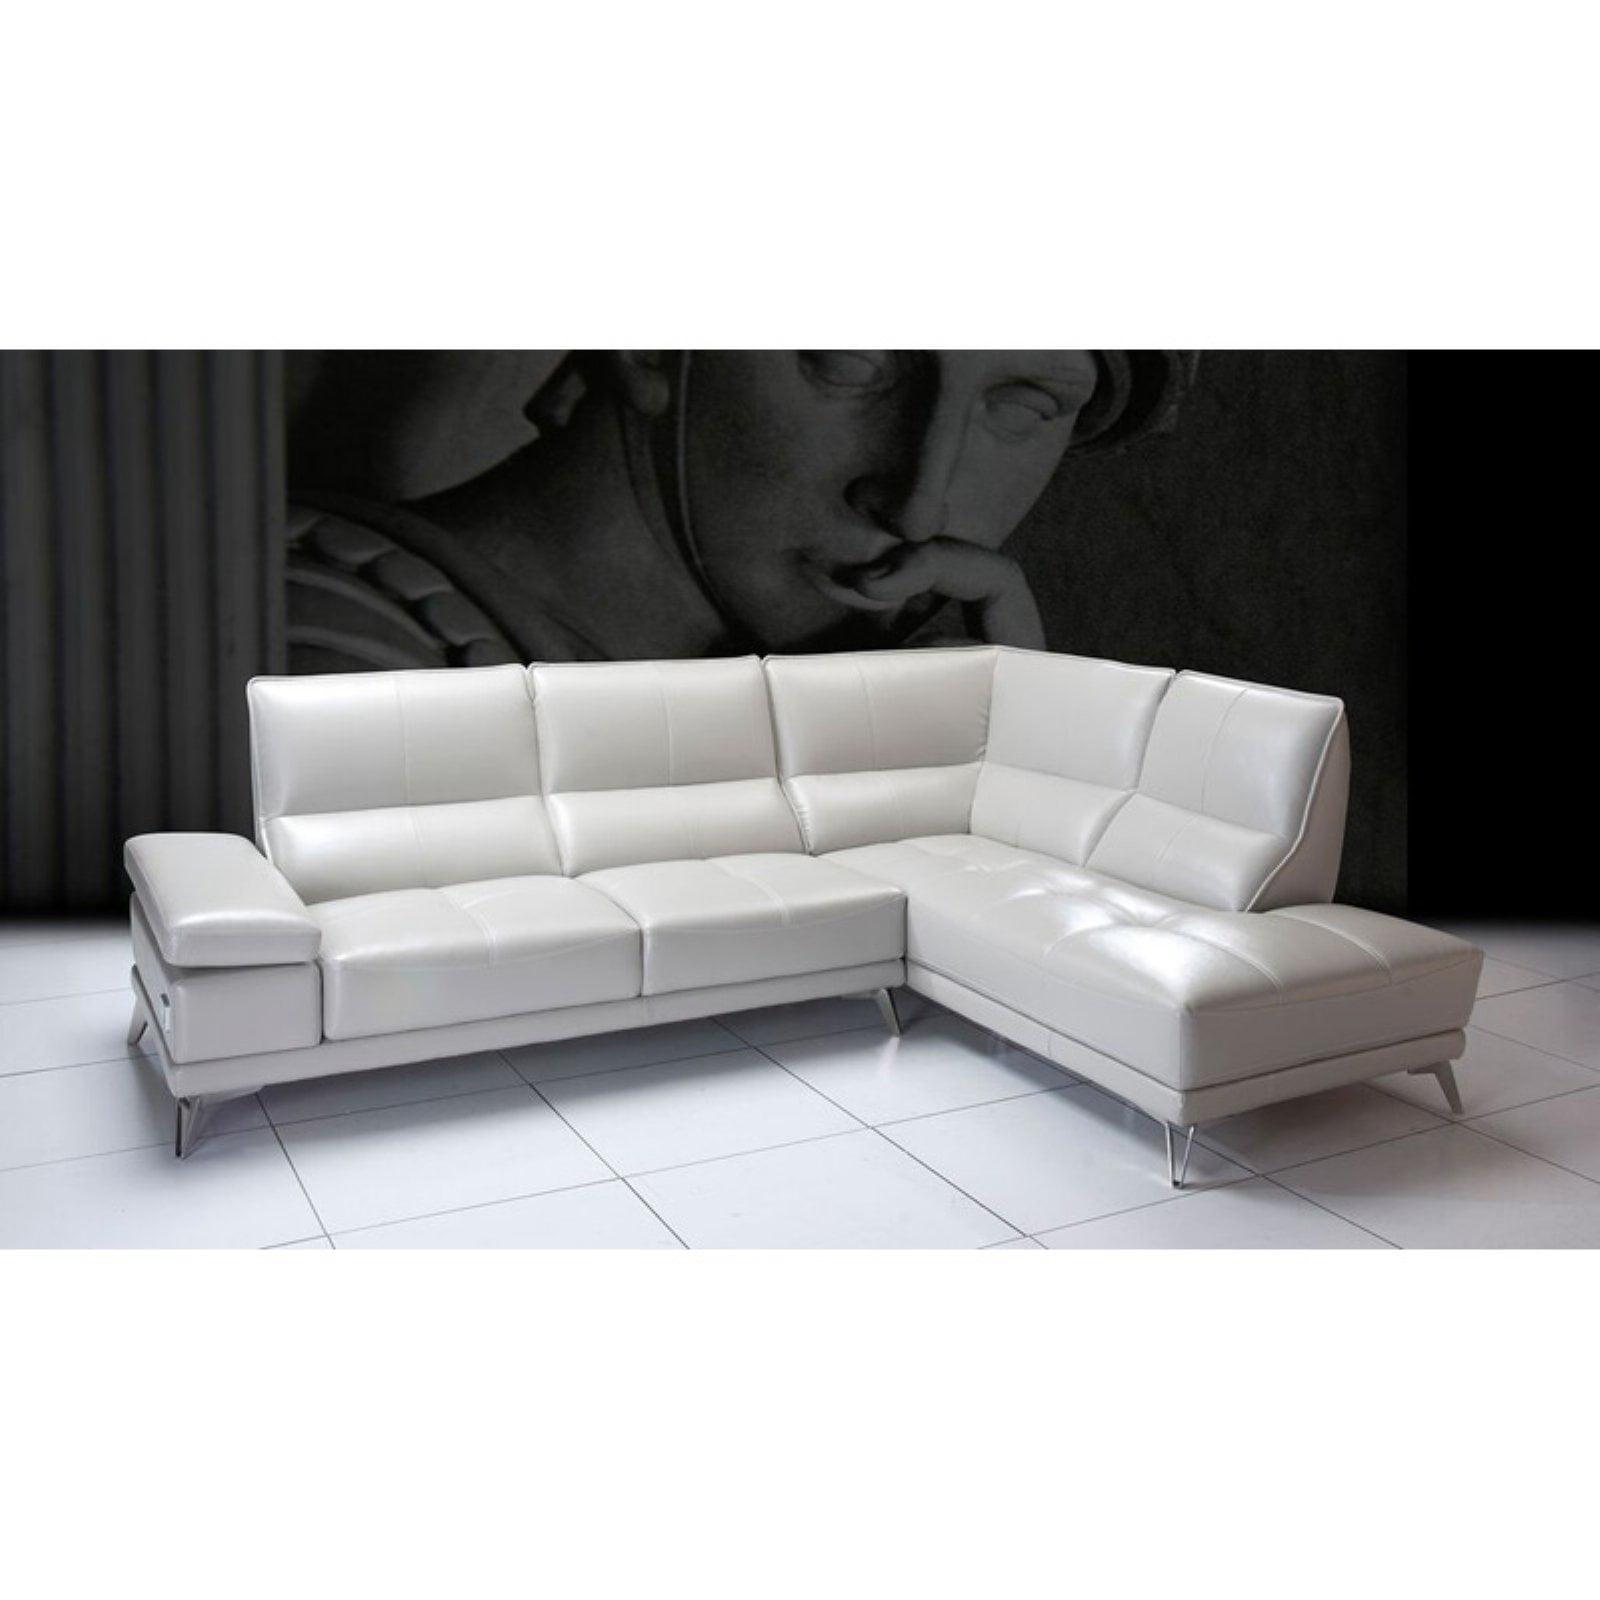 American Eagle Furniture Leesburg Sectional Sofa